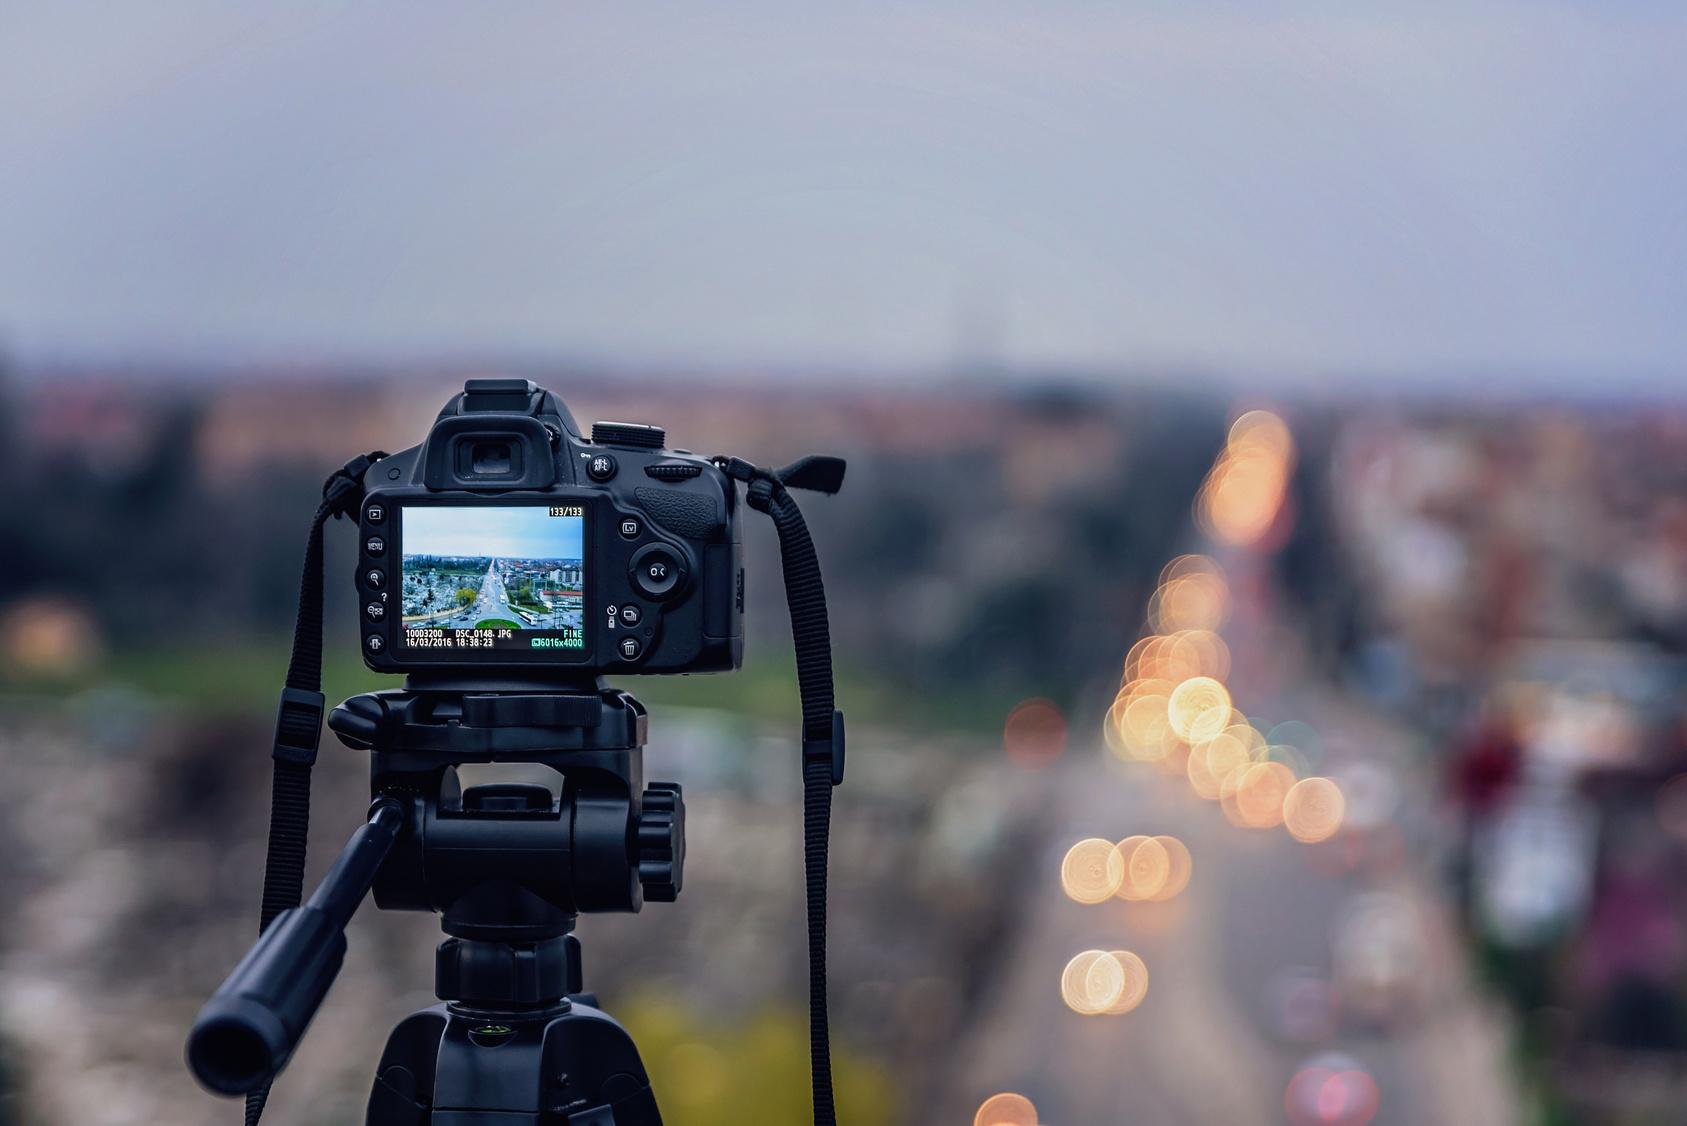 Kamera auf Stativ vor Stadtlandschaft.